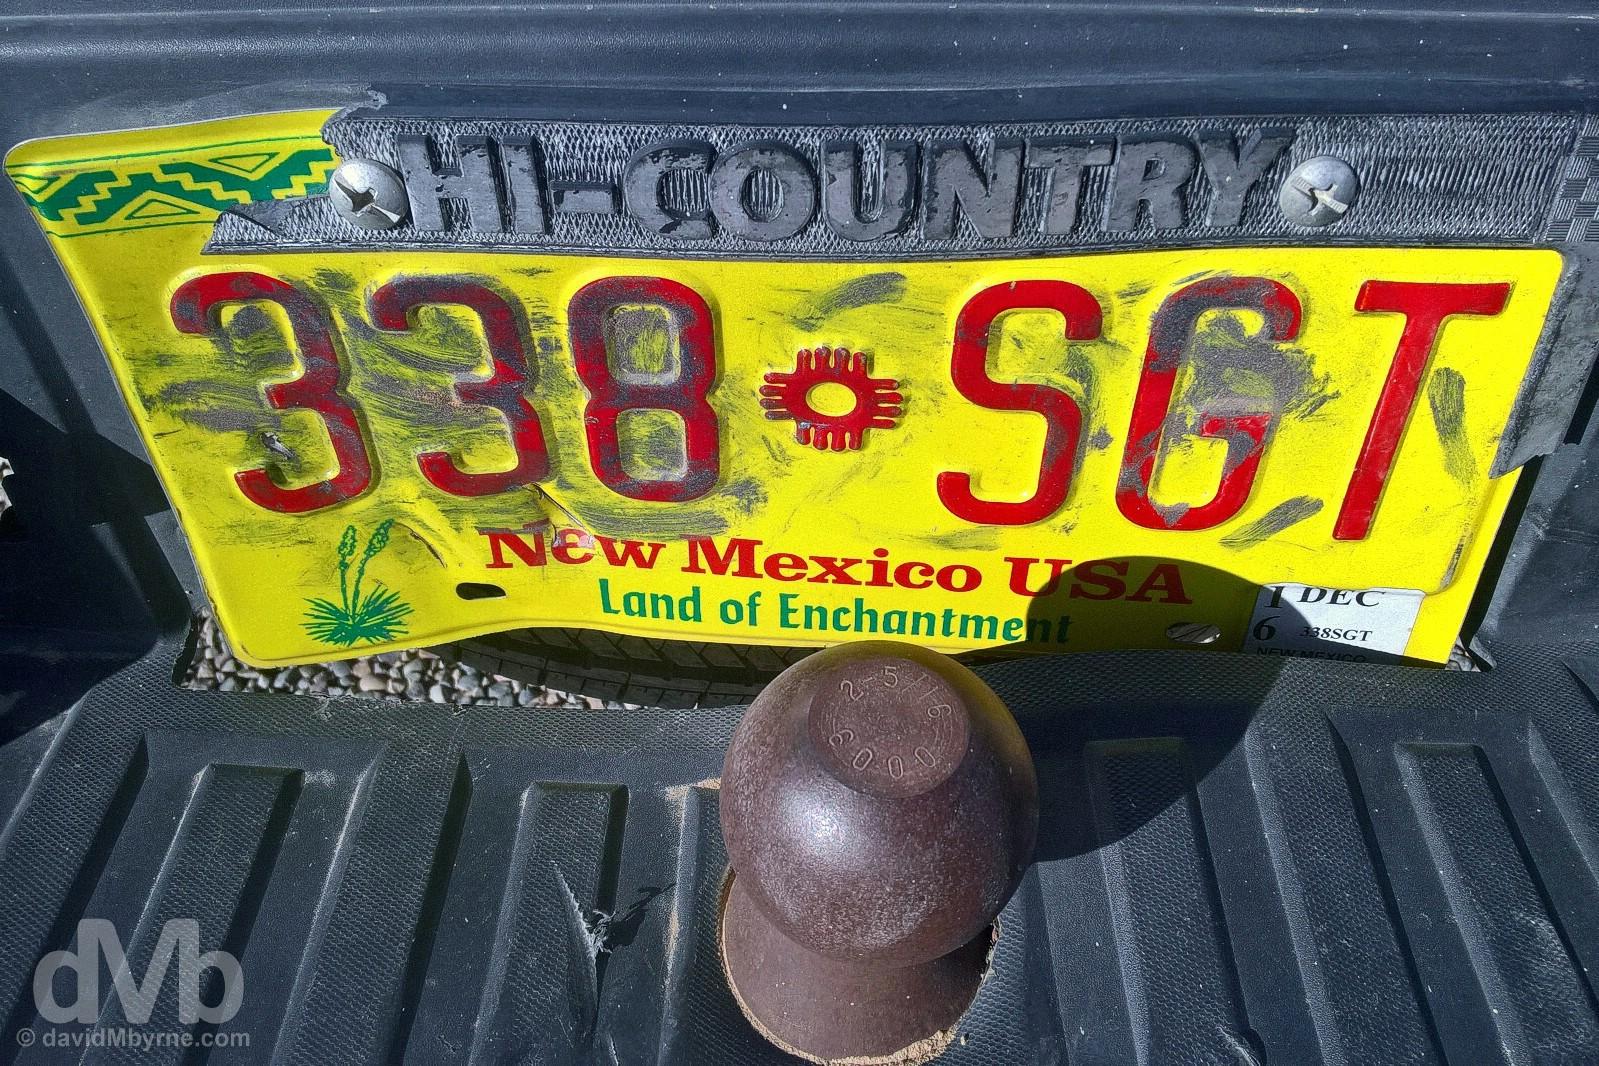 Teec Nos Pos Trading Post, Navajo Nation, Arizona. September 11, 2016.